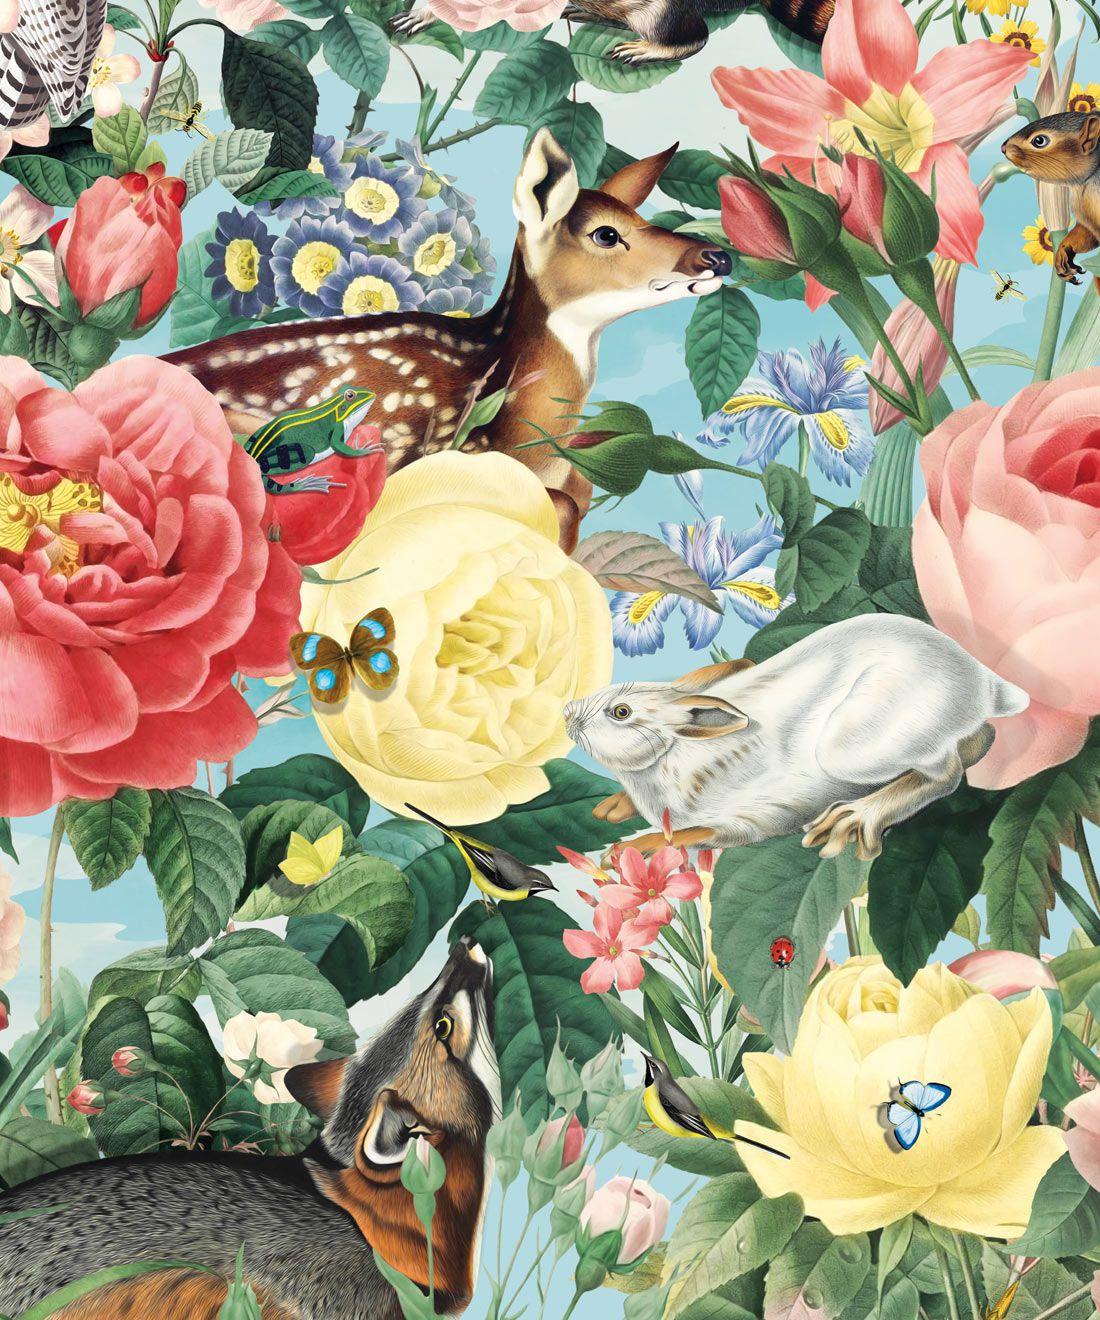 Bush Bouquet Spring Wallpaper • Blue Sky Colored Wallpaper • Assorted Color and Multi-color wallpaper • Floral Wallpaper • Wallpaper With Forest Animals • Swatch